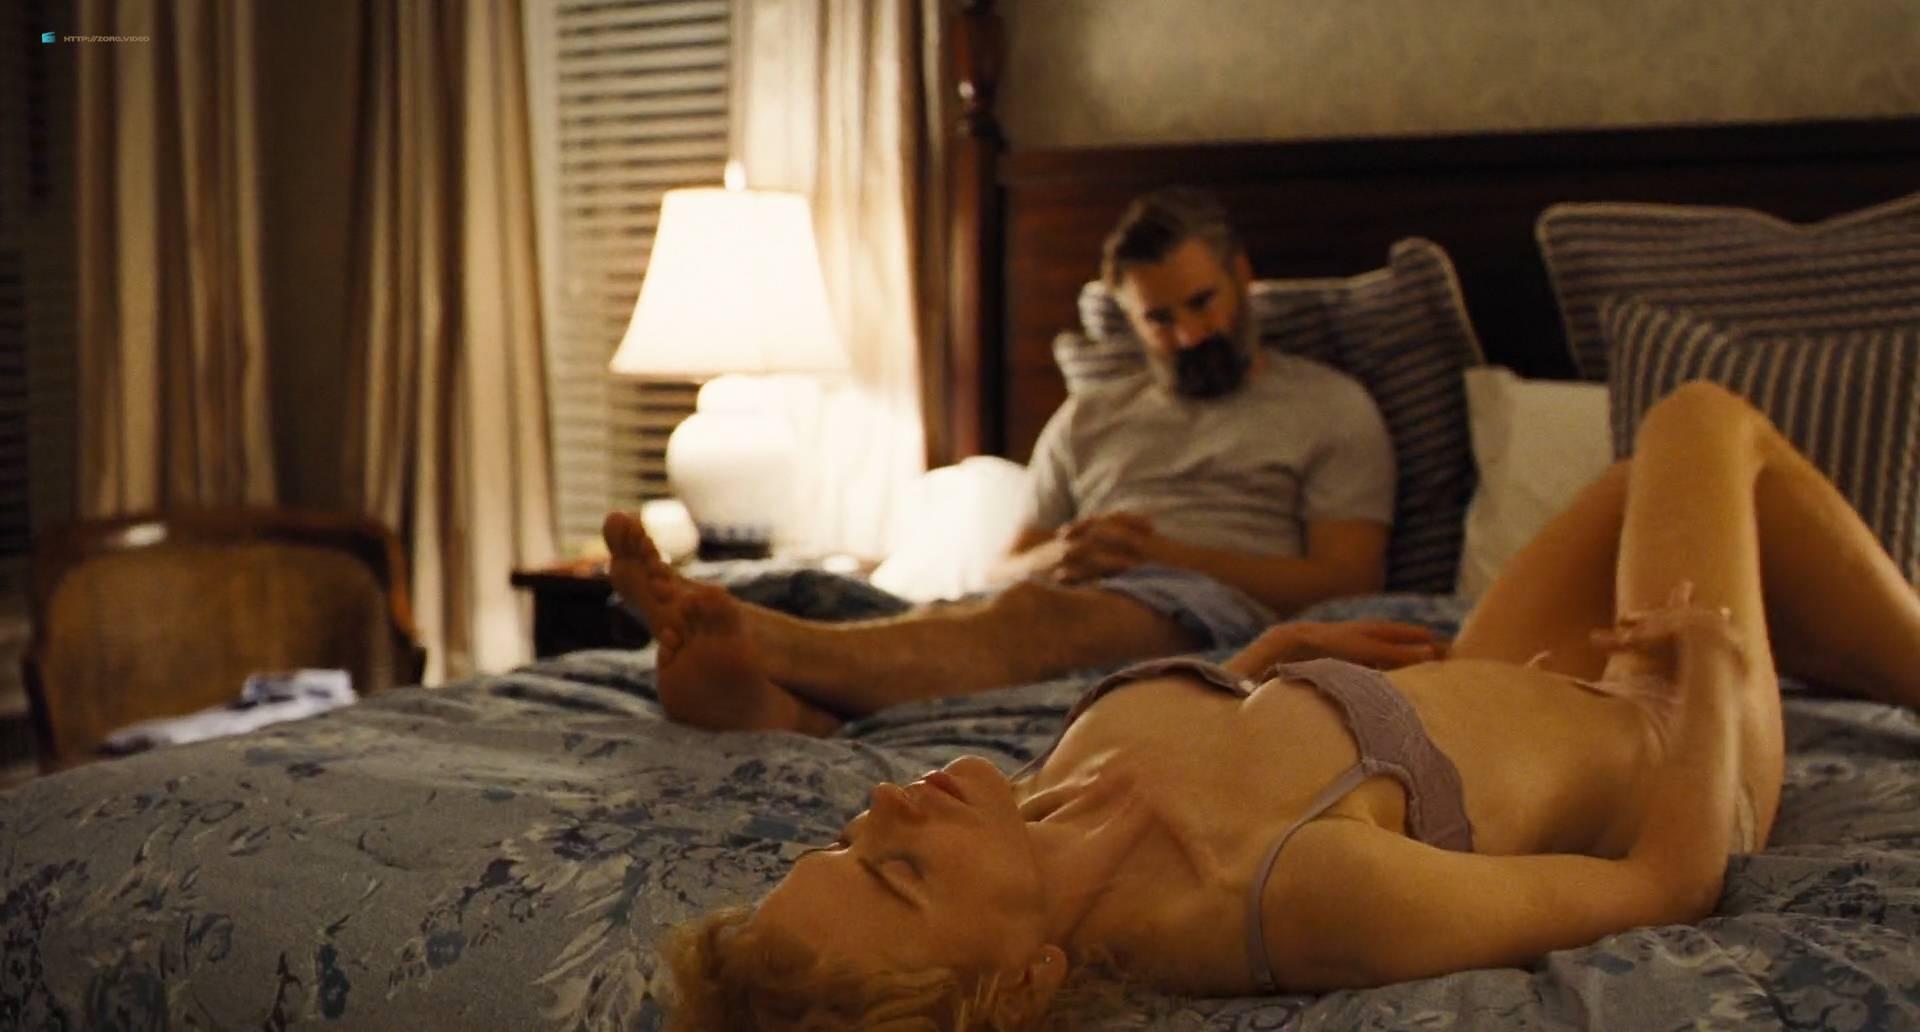 Nicole-Kidman-nude-bush-and-boobs-The-Killing-of-a-Sacred-Deer-2017-HD-1080p-04.jpg